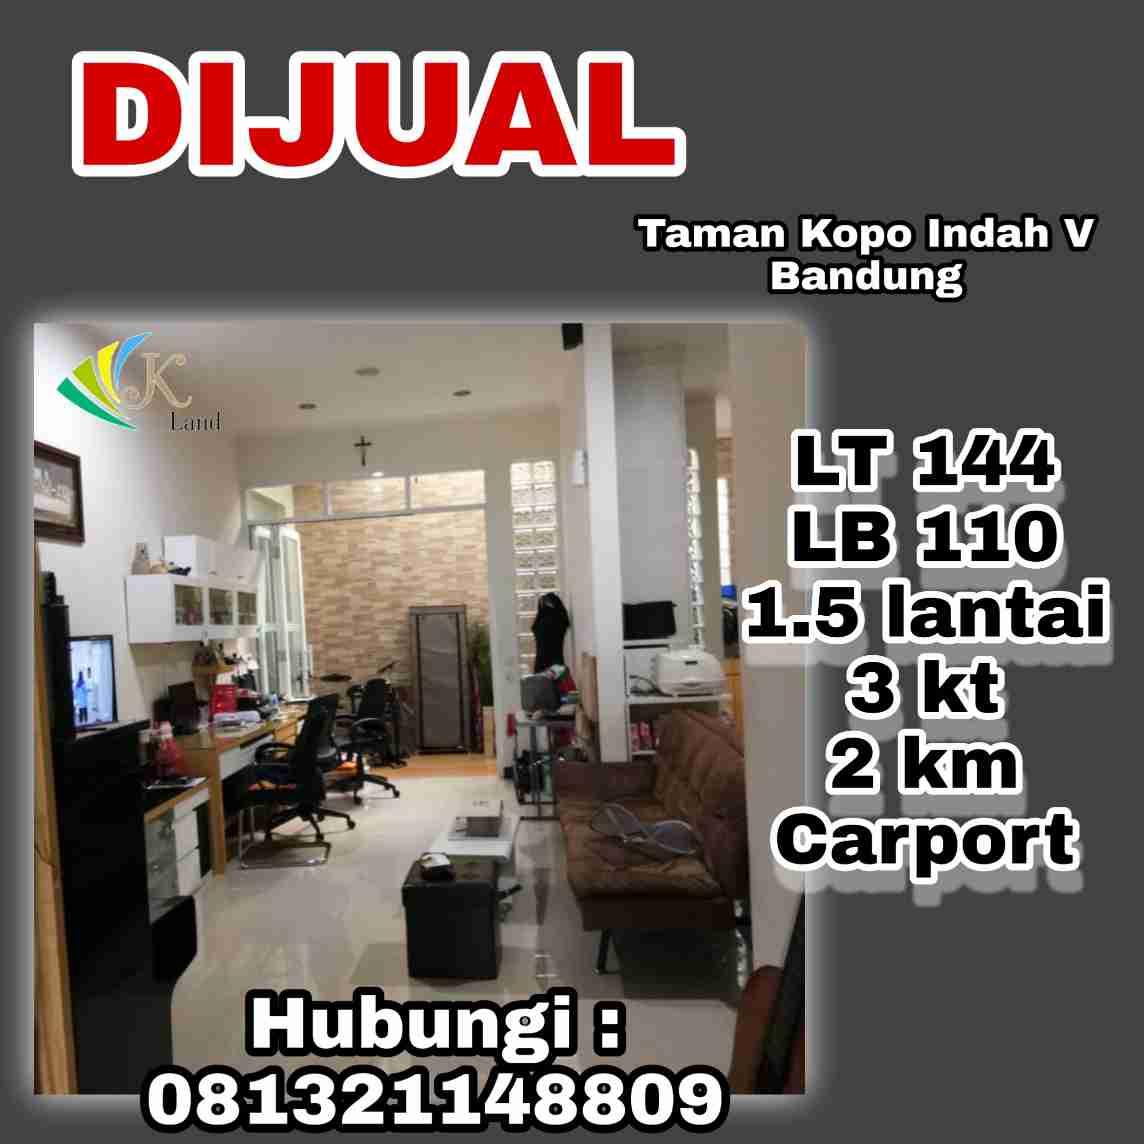 Jual Rumah Summerville Taman Kopo Indah V Bandung